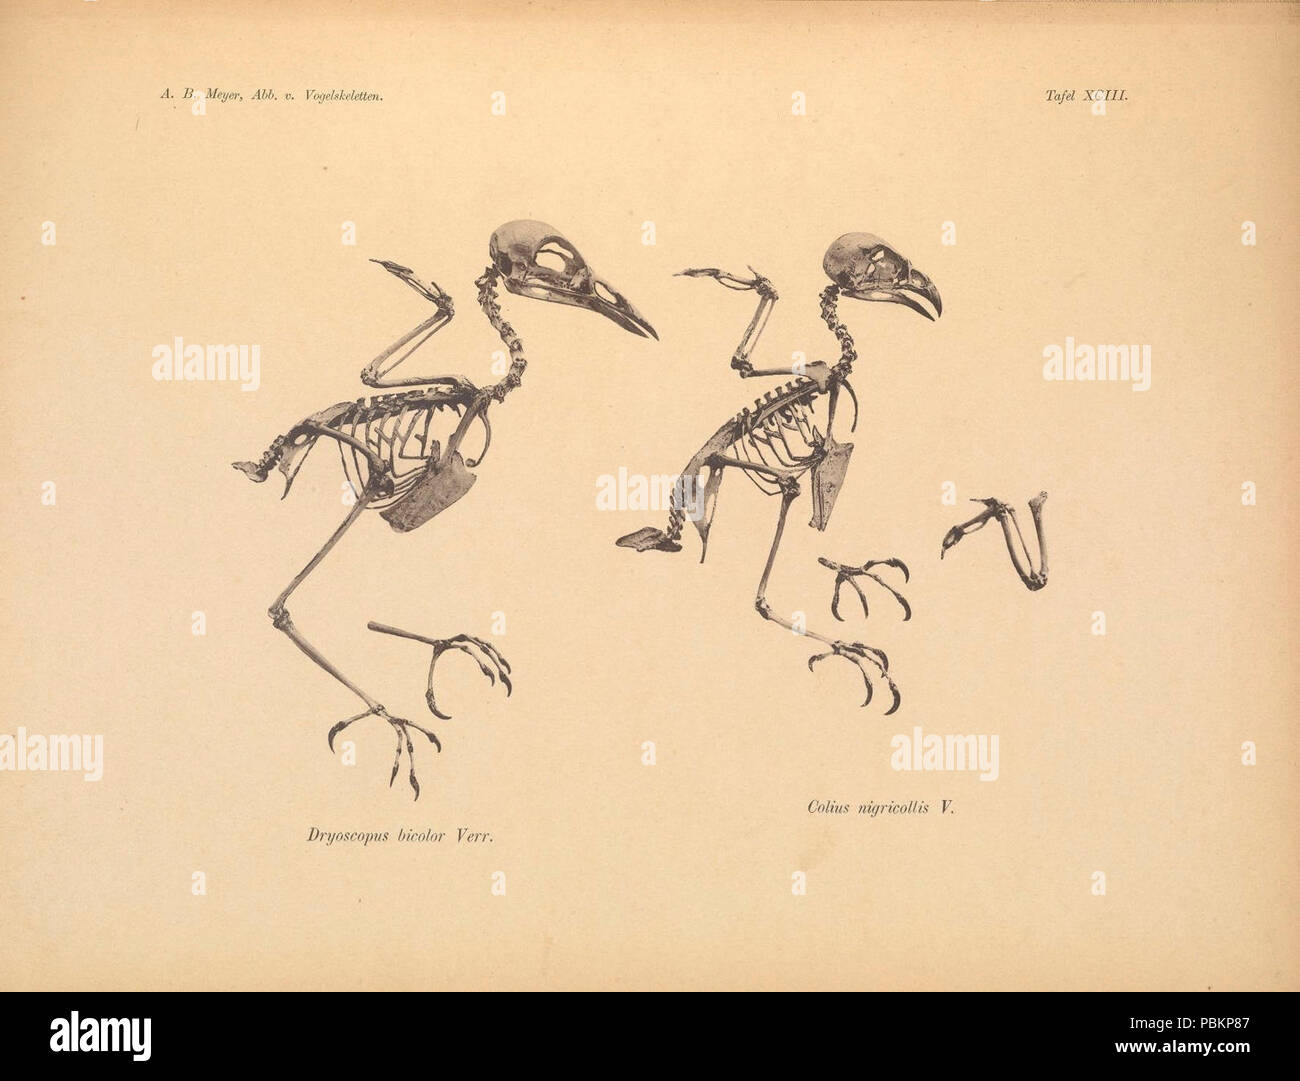 Abbildungen von Vogel-Skeletten (Tafel XCIII) - Stock Image